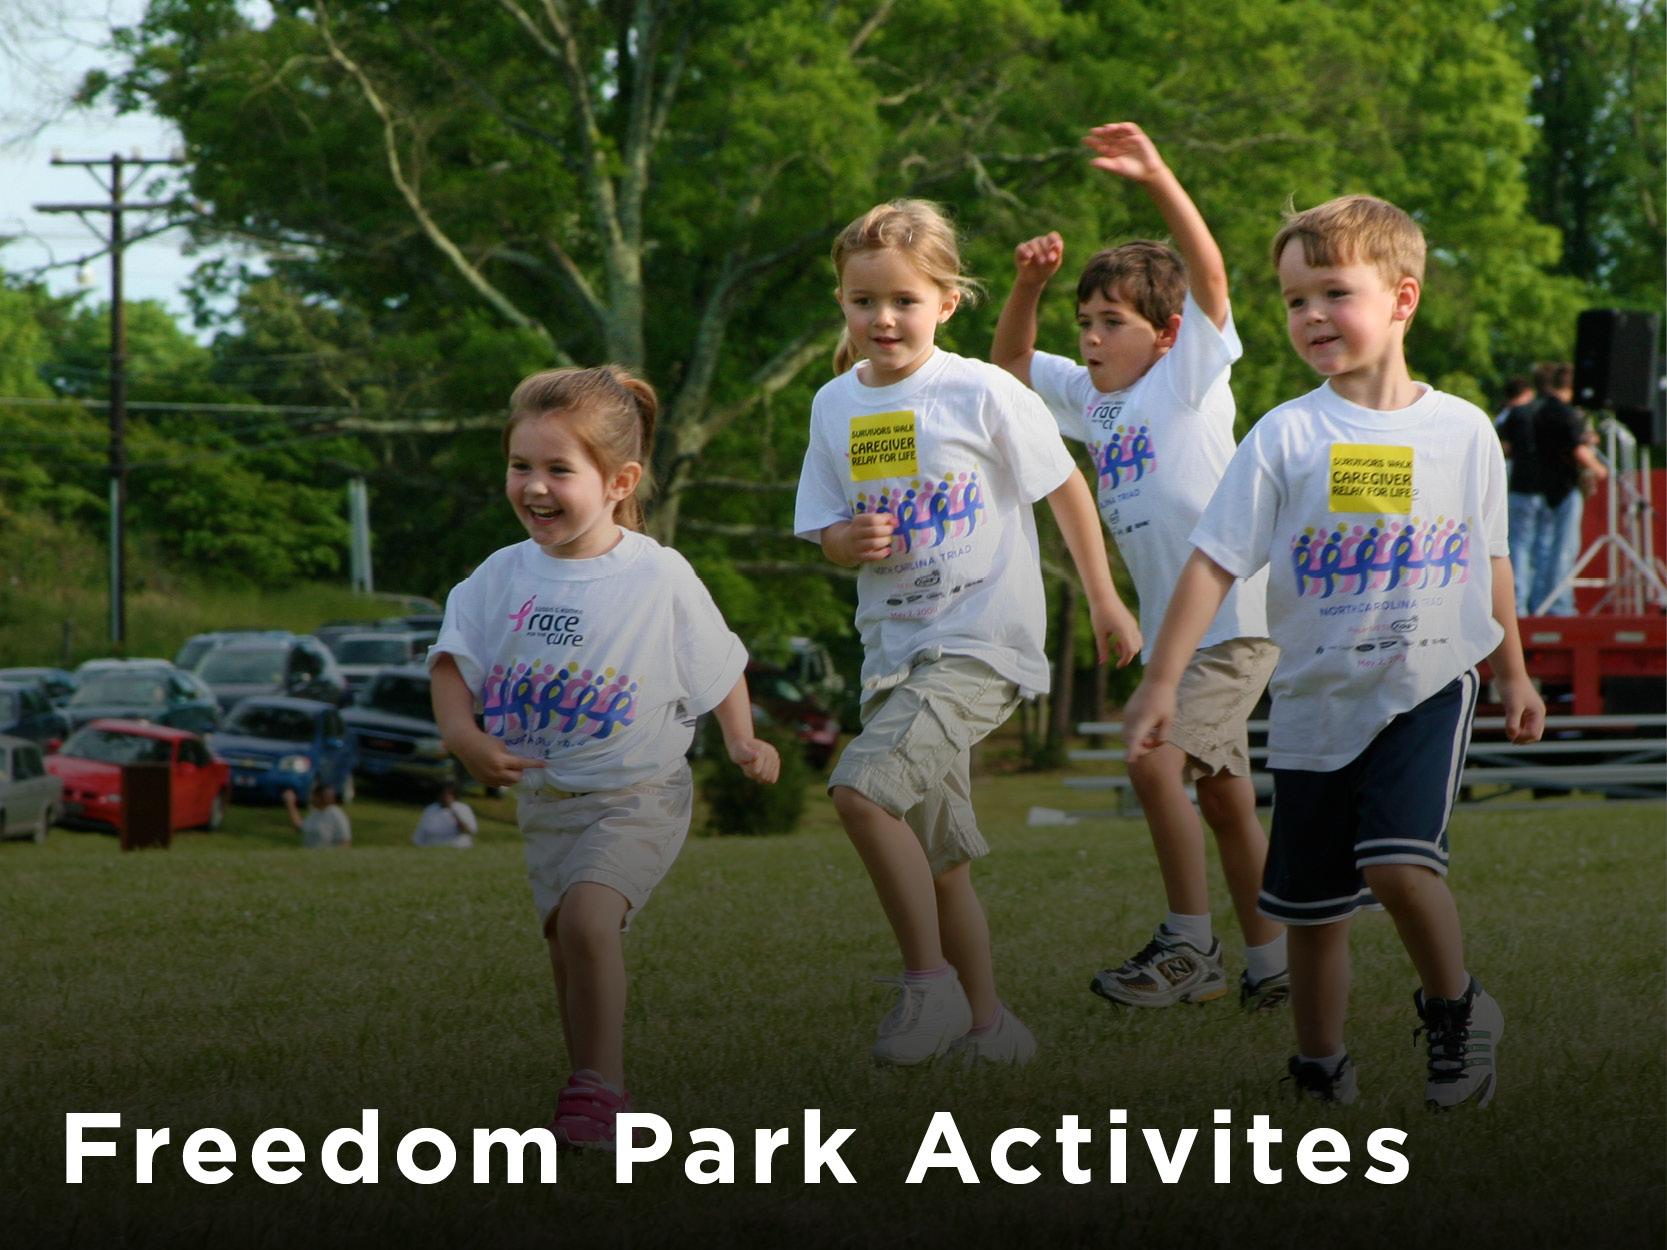 Freedom Park Activities